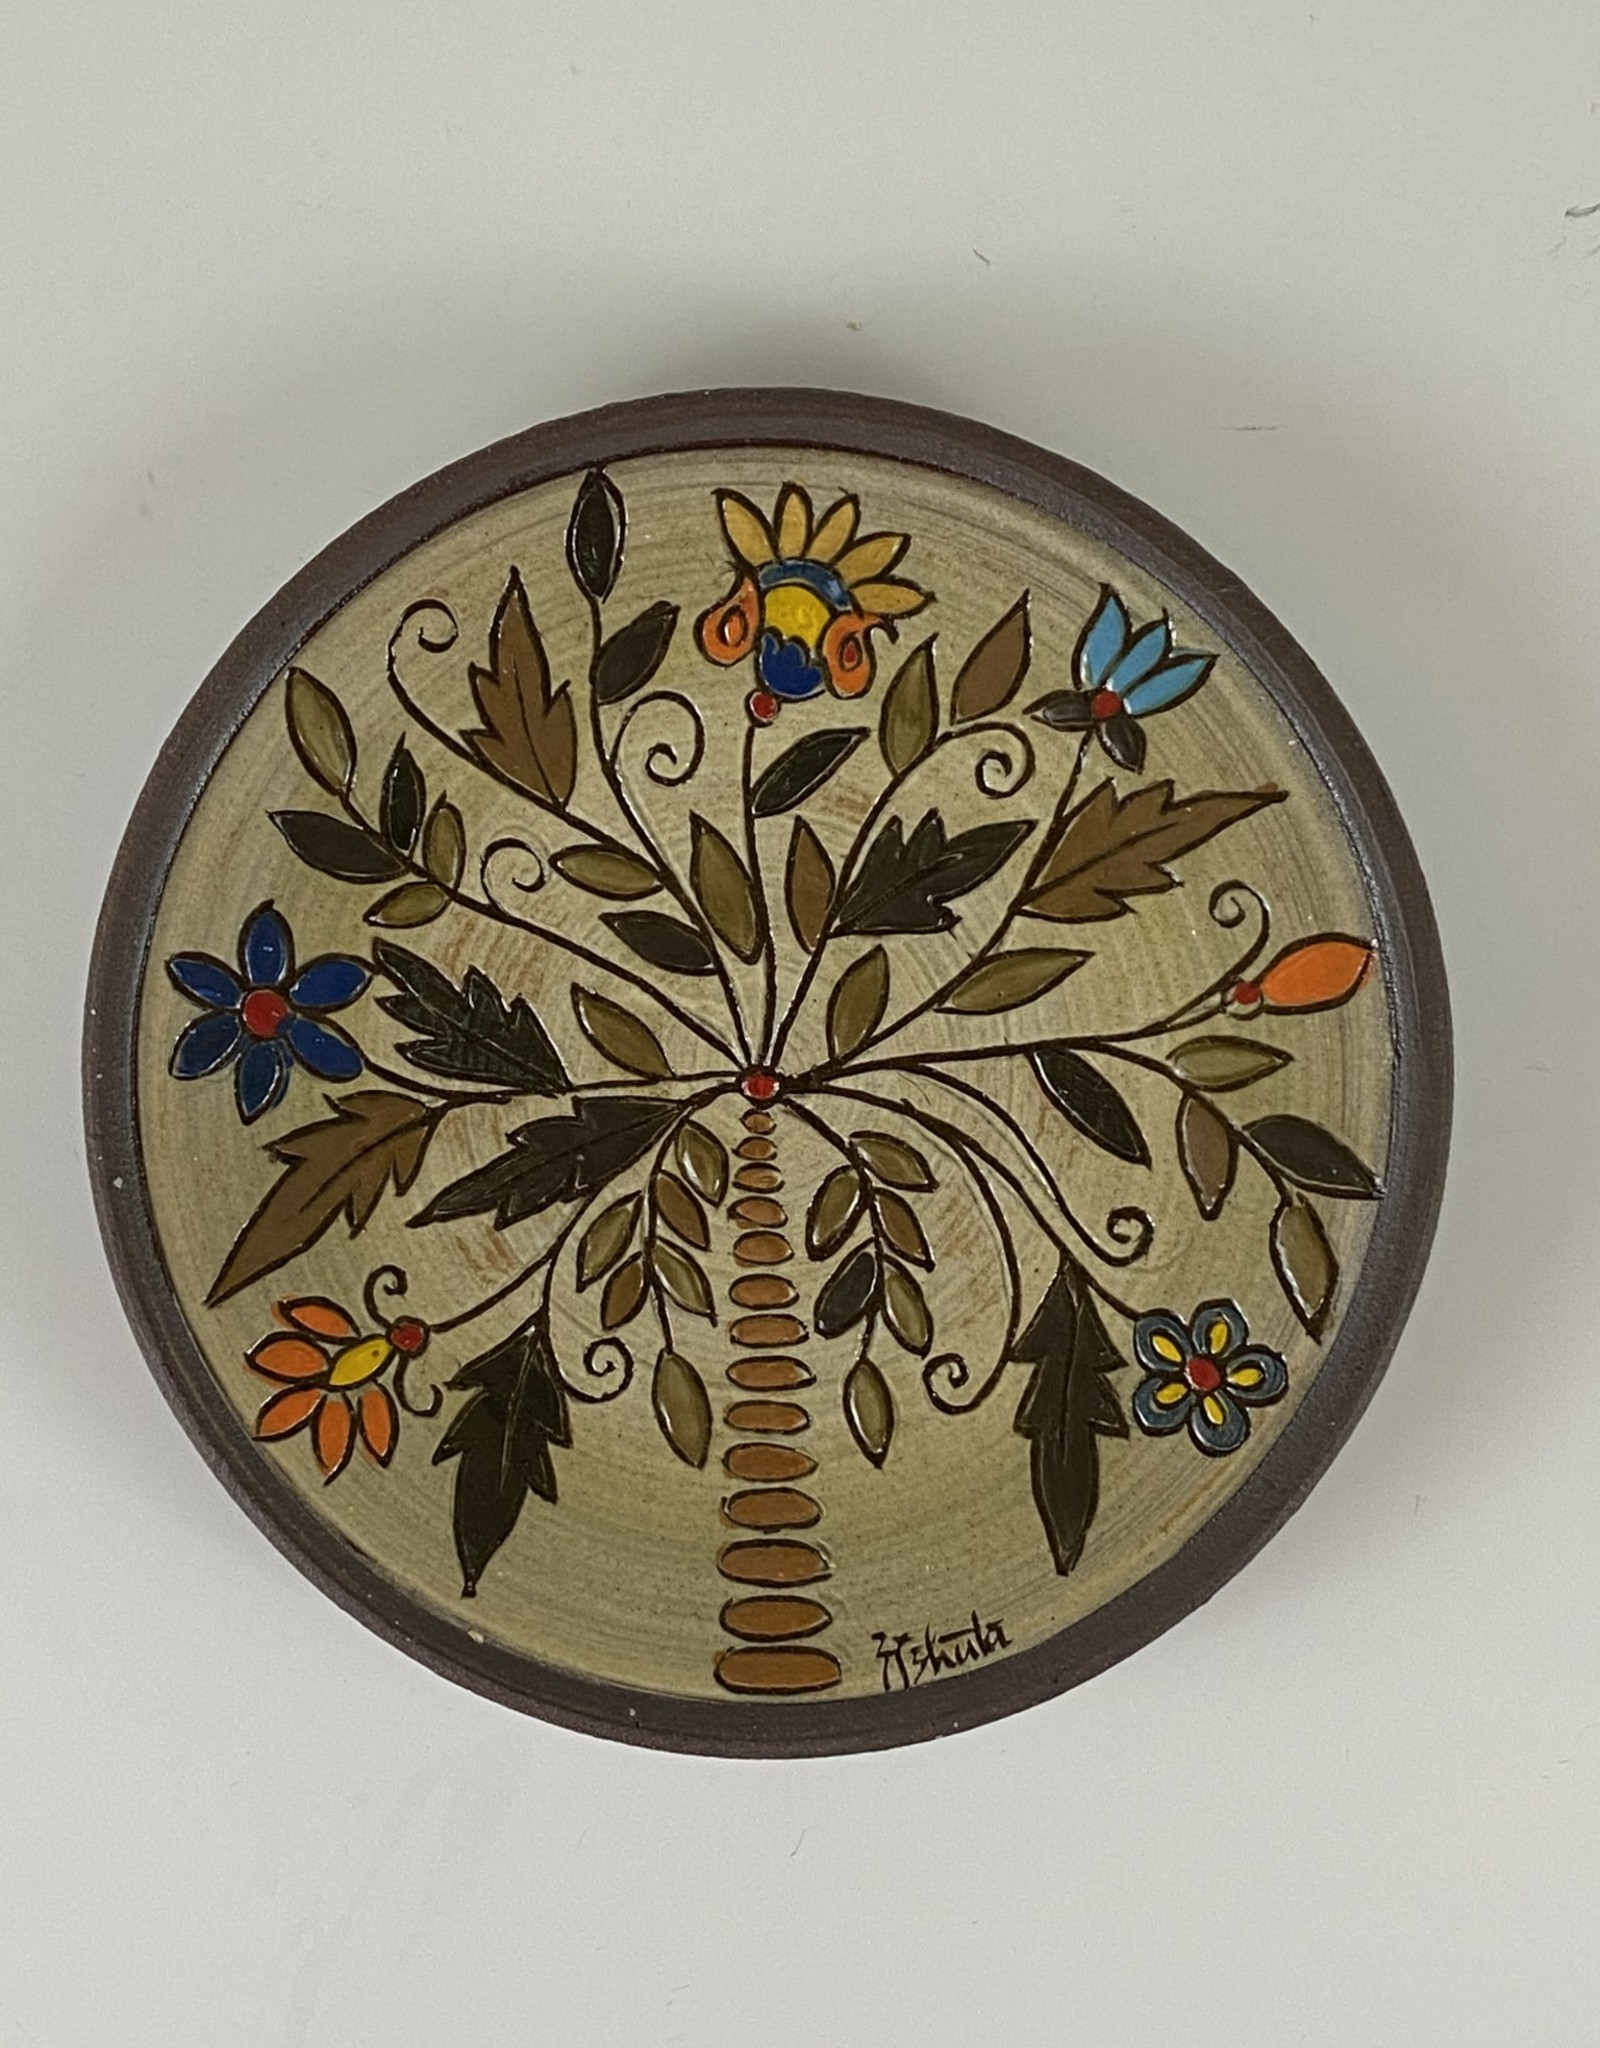 Anshula Tayal Amaati Tree of life plate